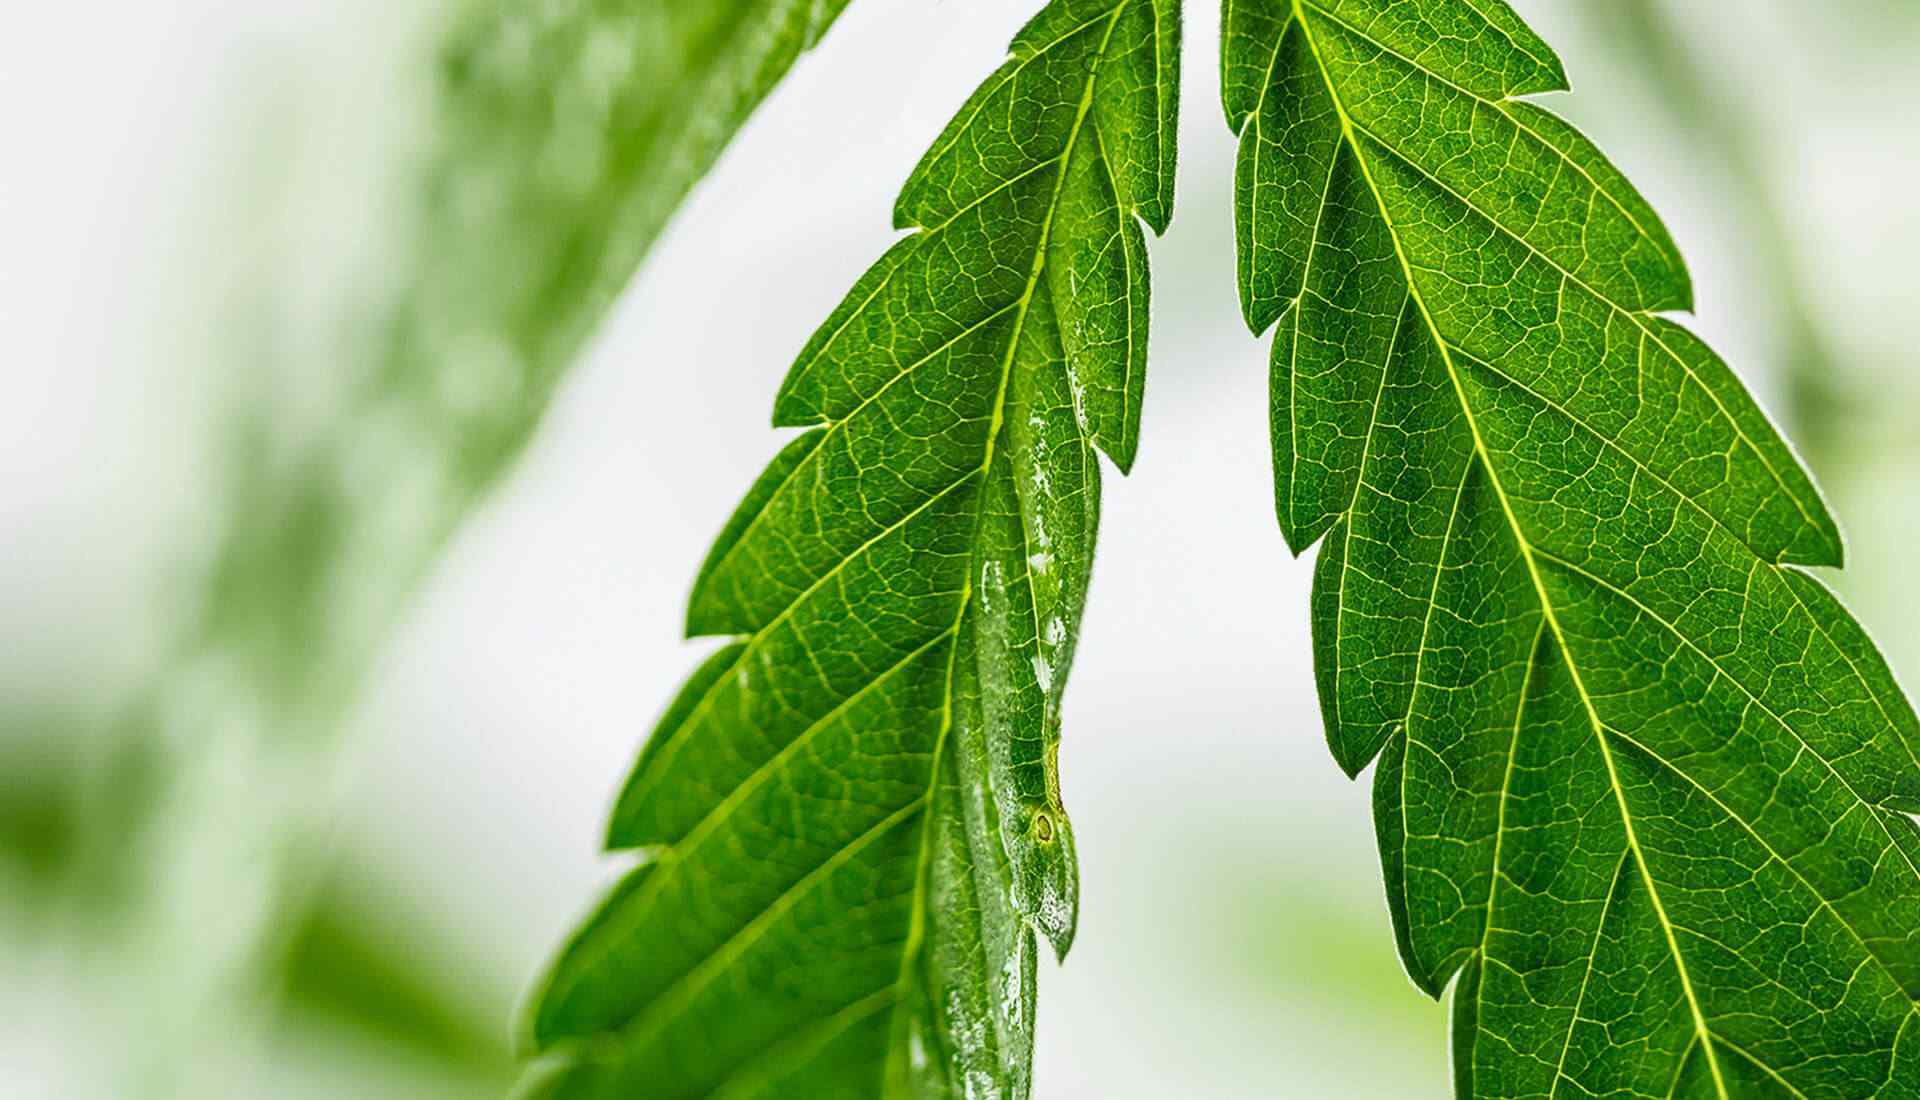 Close up of cannabis or hemp leaf